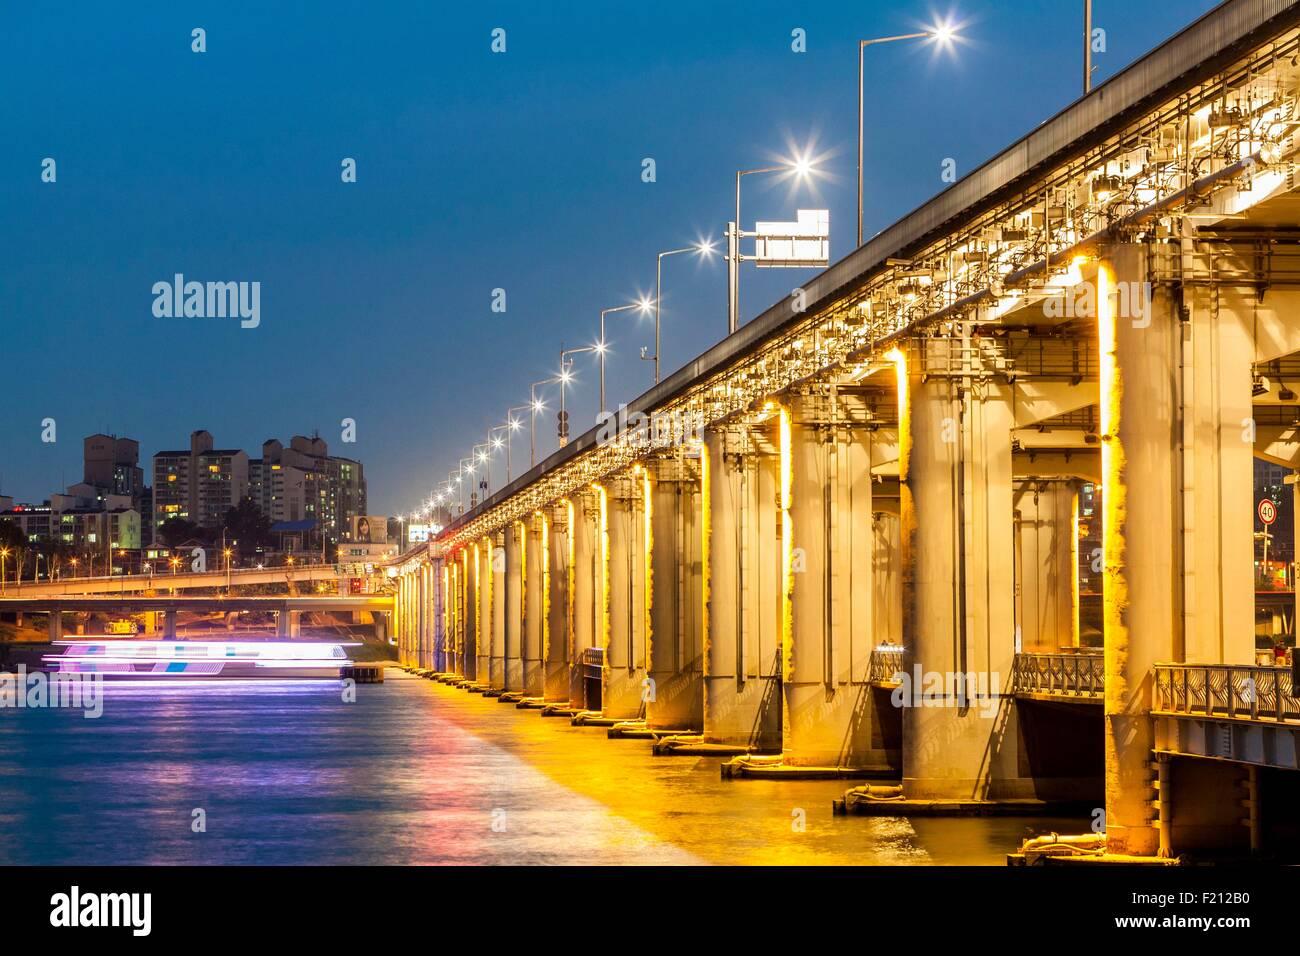 South Korea, Seoul, Banpo Bridge (570 meters long) on ??the Han River - Stock Image